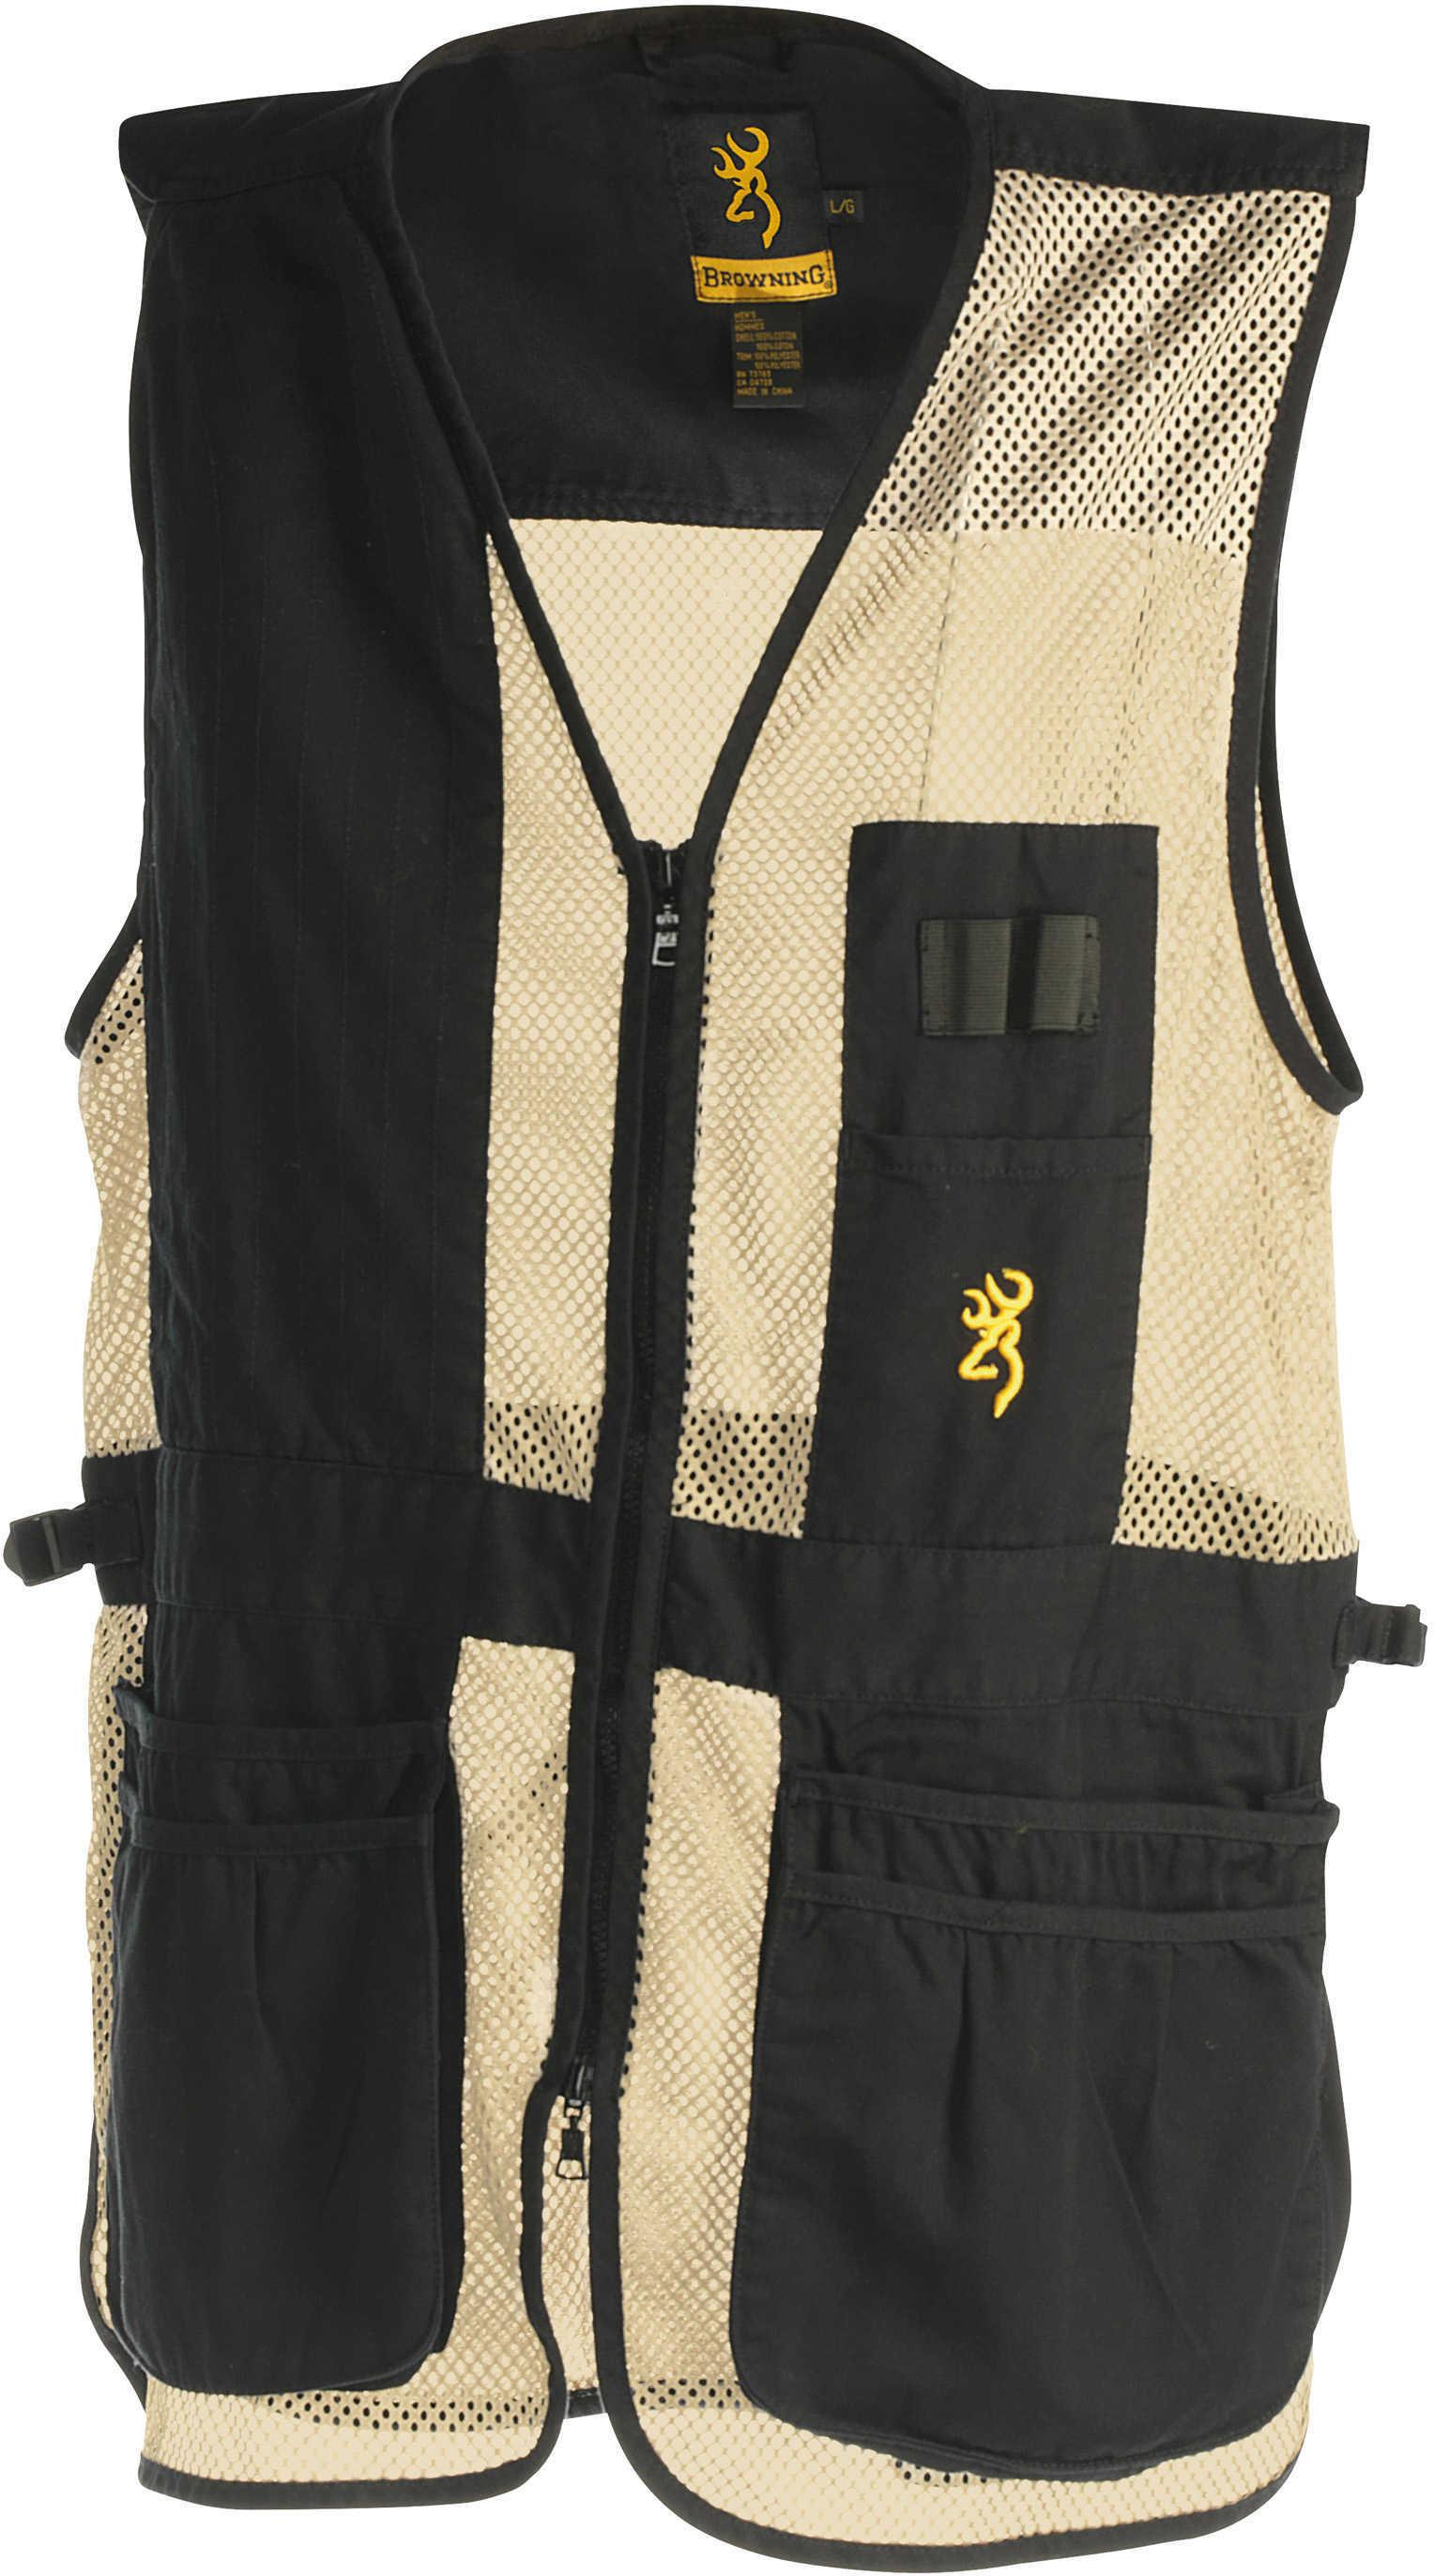 Browning Trapper Creek Mesh Shooting Vest, Black/Tan Xx-Large